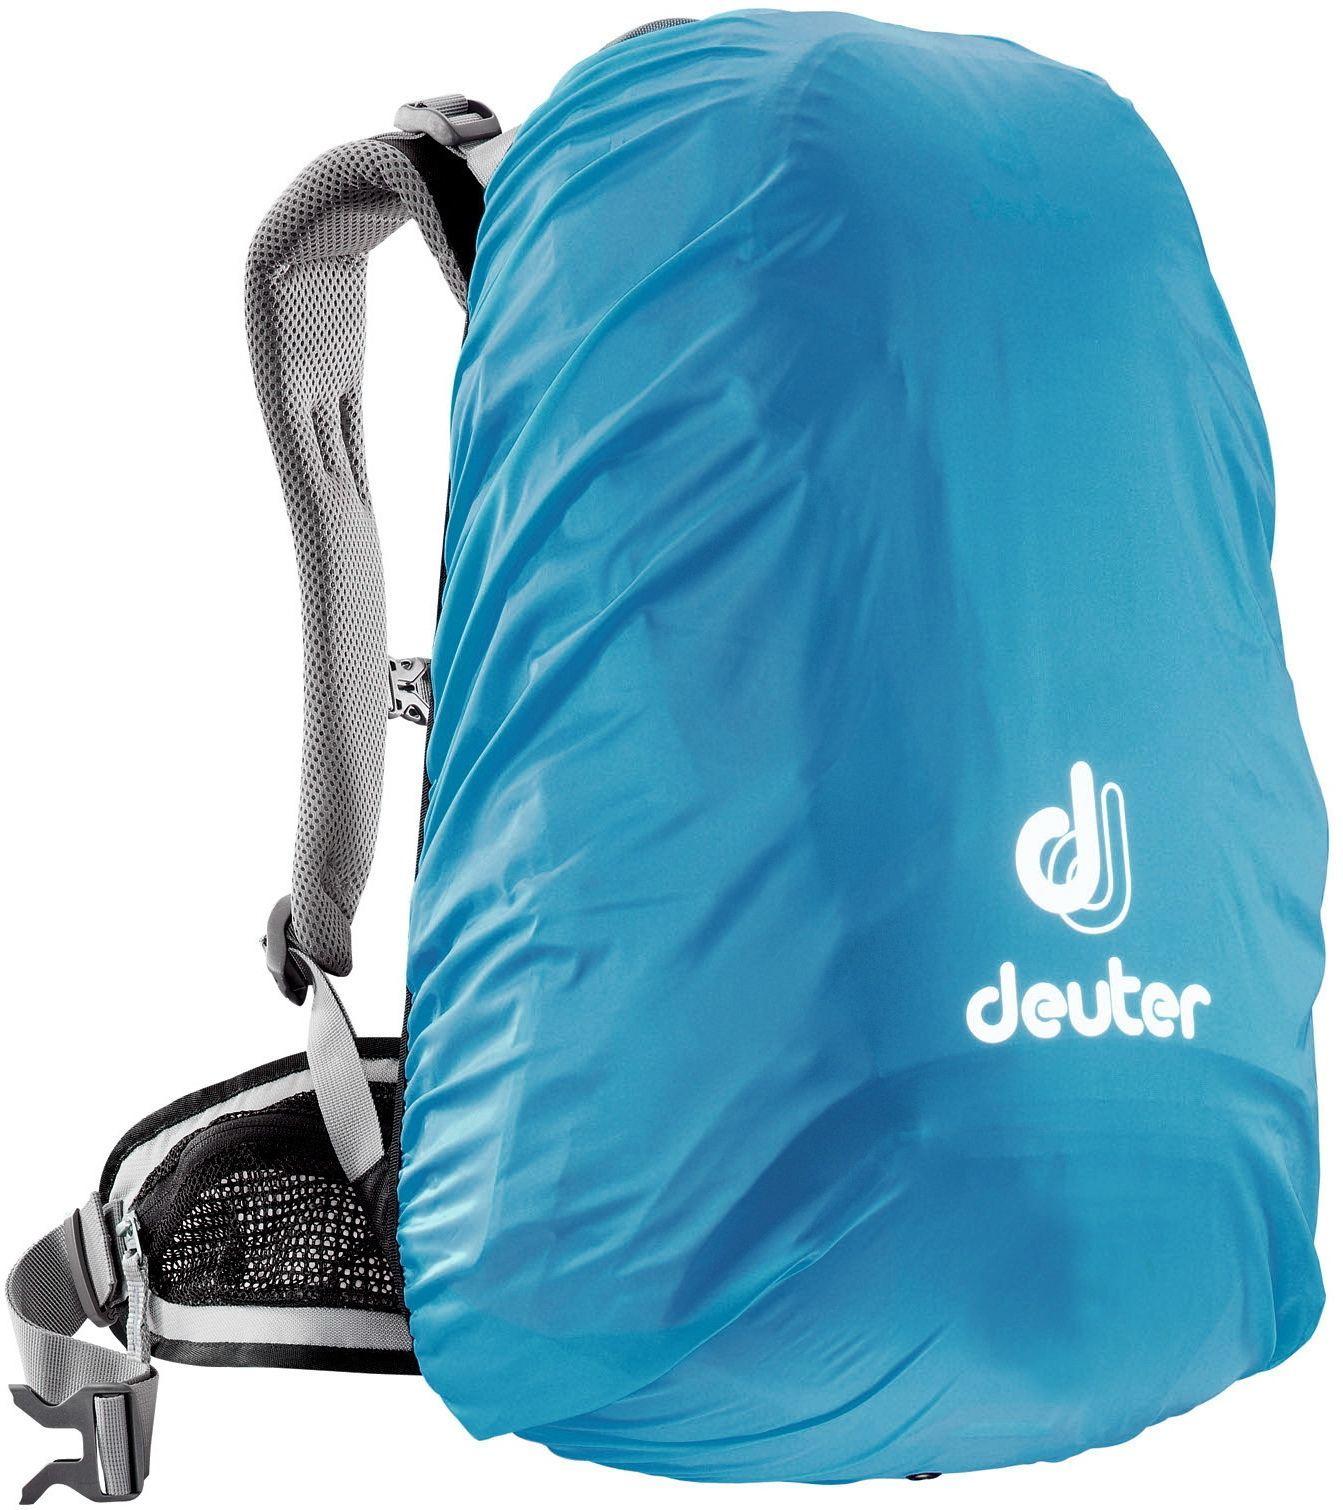 Чехол для рюкзака Deuter 2015 Raincover I coolblue, Рюкзаки для охоты и рыбалки - арт. 607470285